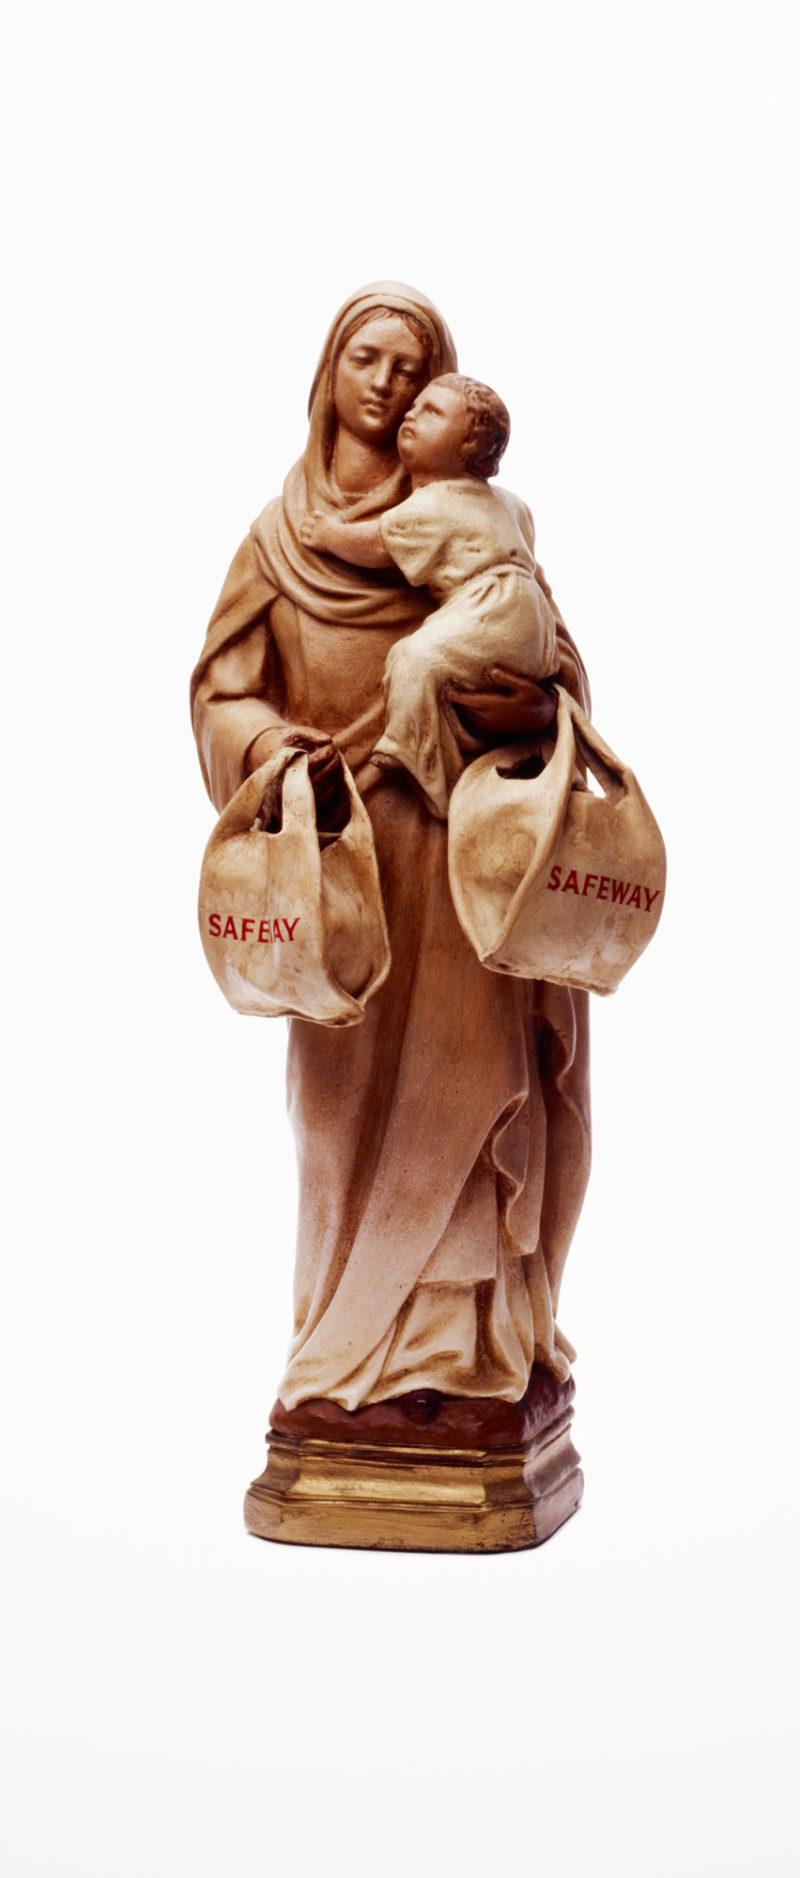 Madonna with Safeways Bag